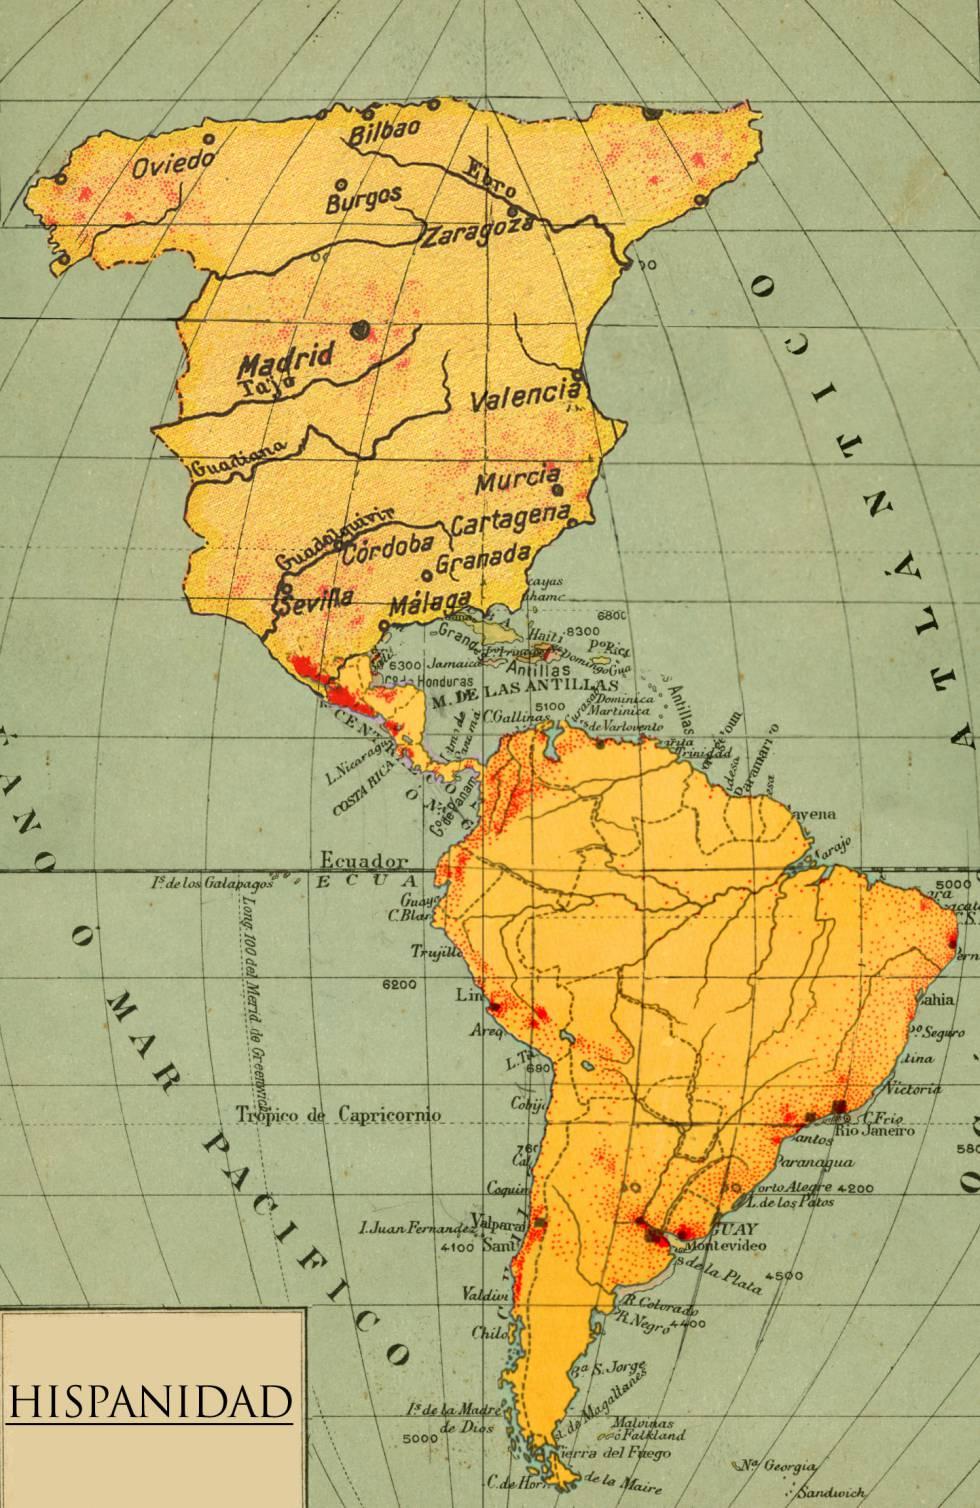 Hispanidad Â¿mala palabra?